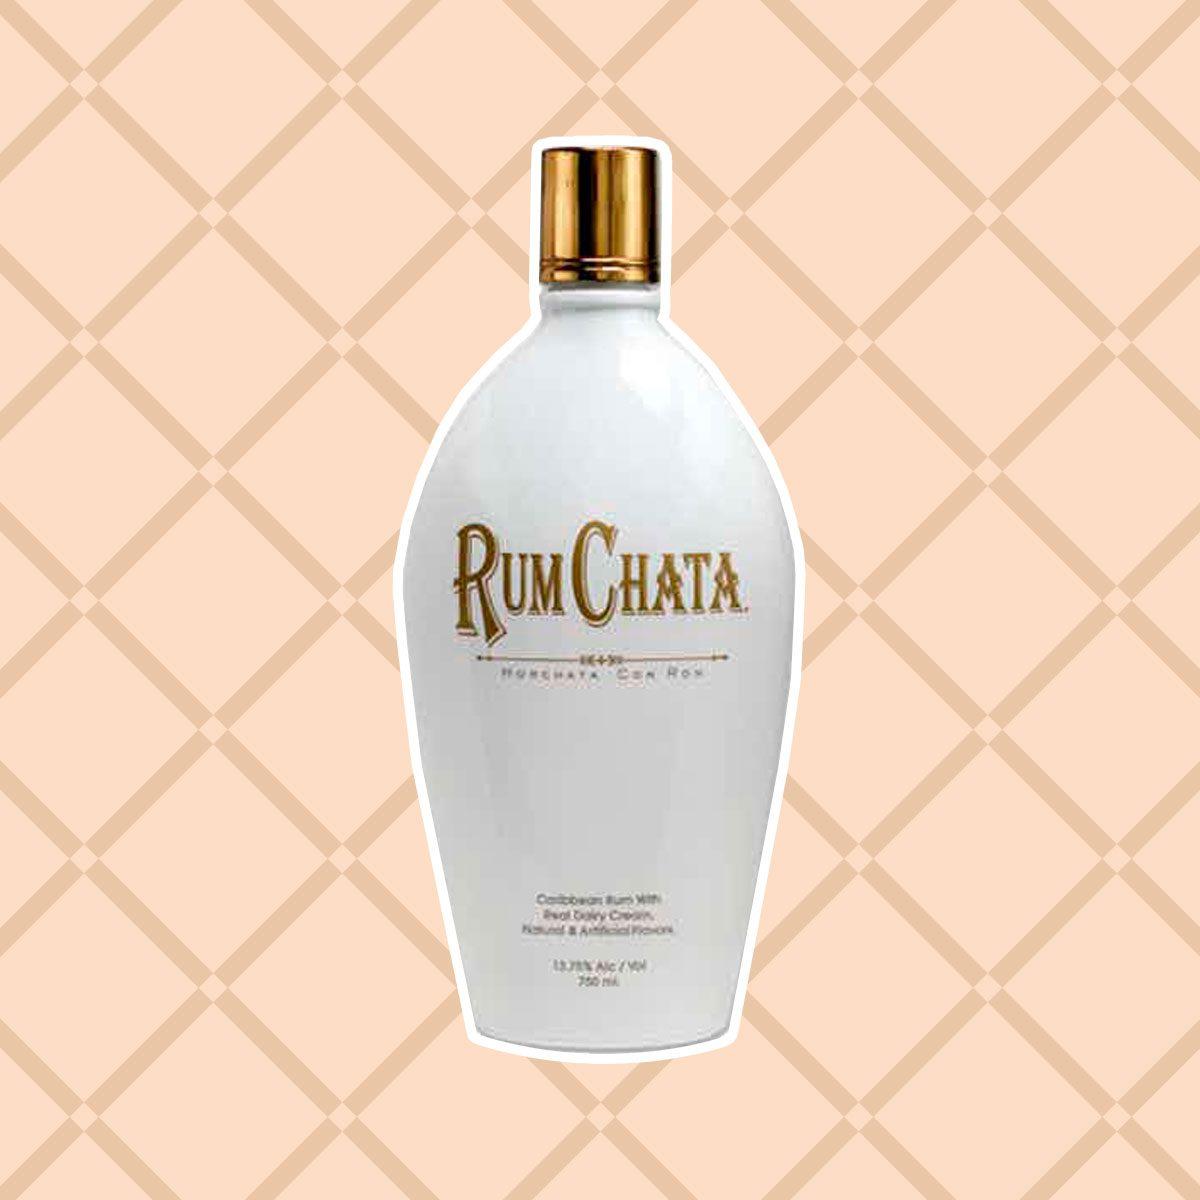 RumChata Horchata Con Ron Cream Liqueur